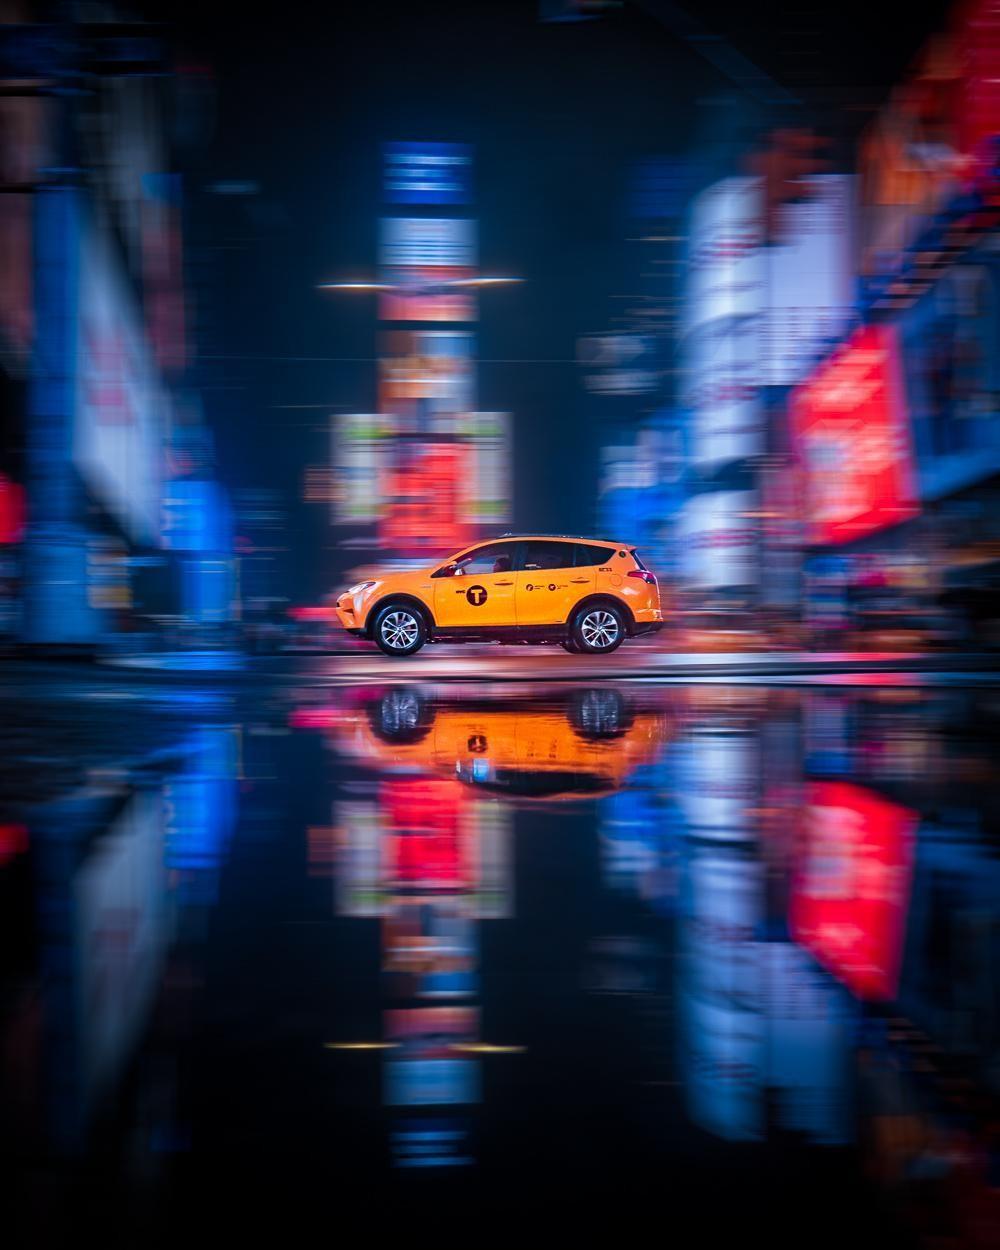 NEW YORK CITY NIGHT TAXI 2